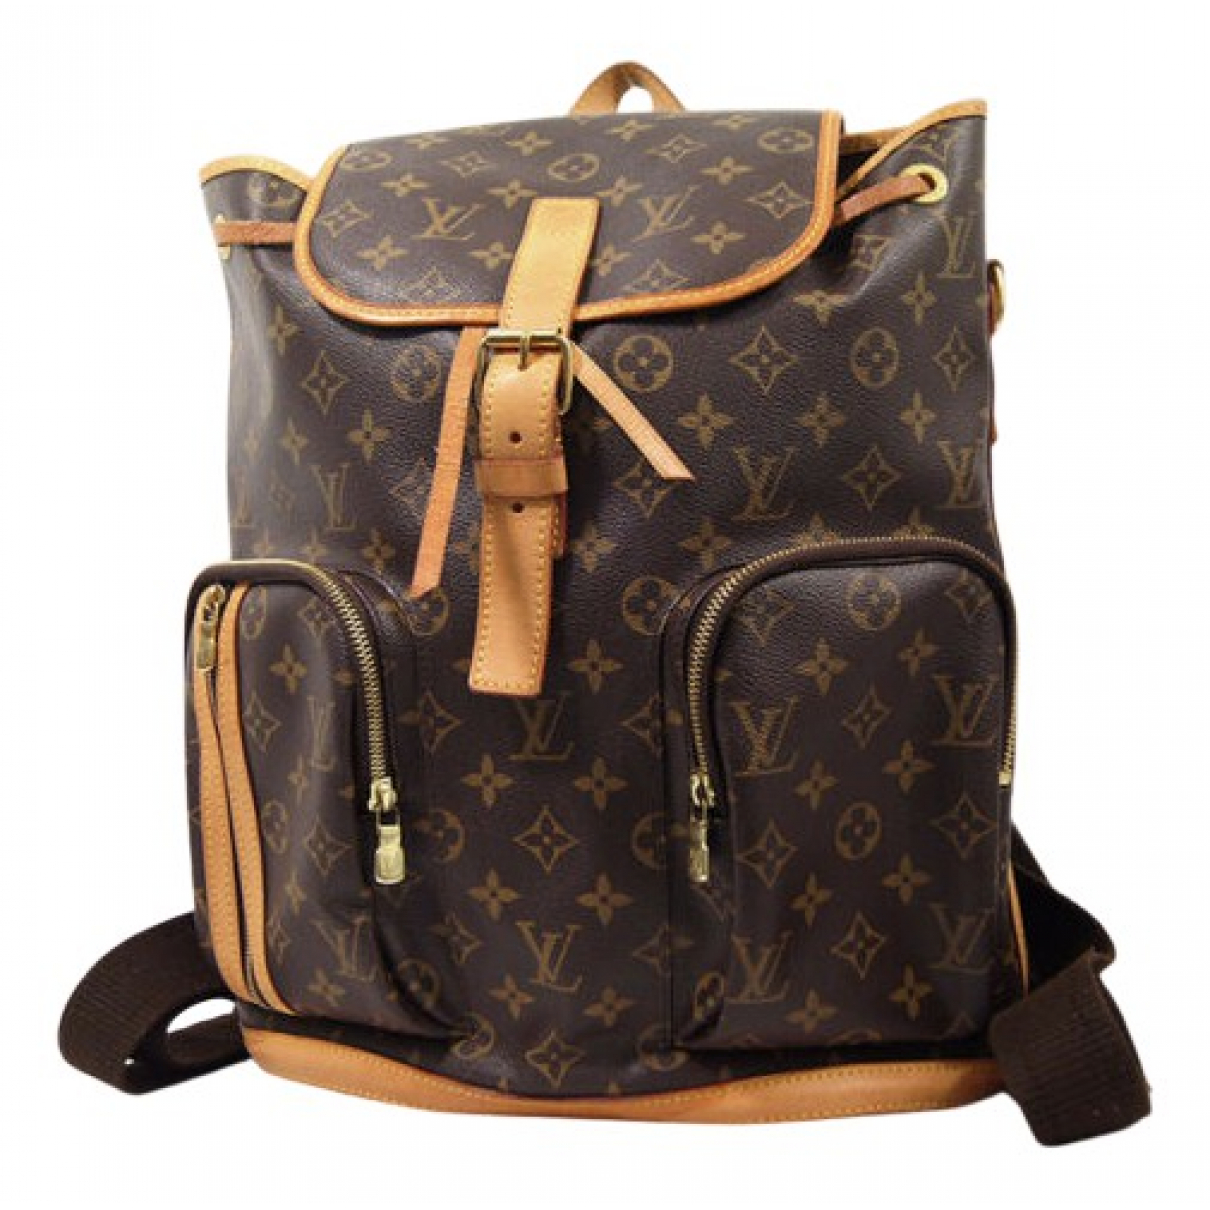 Louis Vuitton Bosphore Backpack Rucksaecke in  Braun Leinen